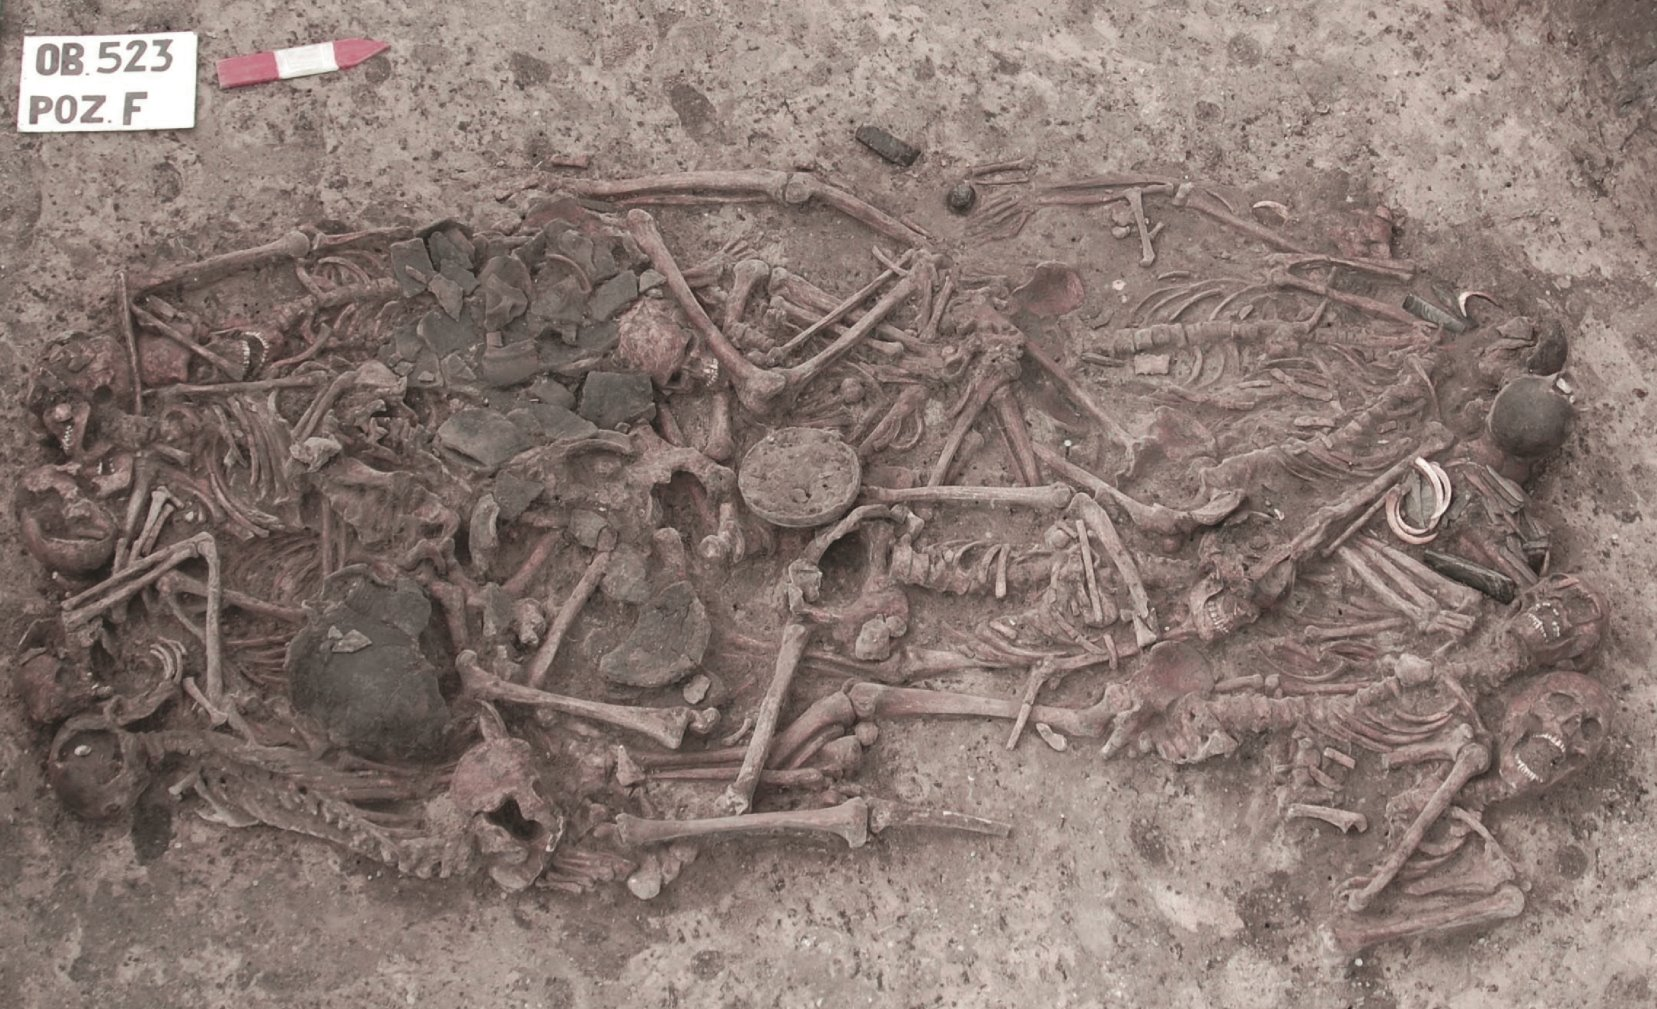 [Imagen: huesos-de-hace-mas-de-5000-anos_bc2fe10c_1657x1009.jpg]